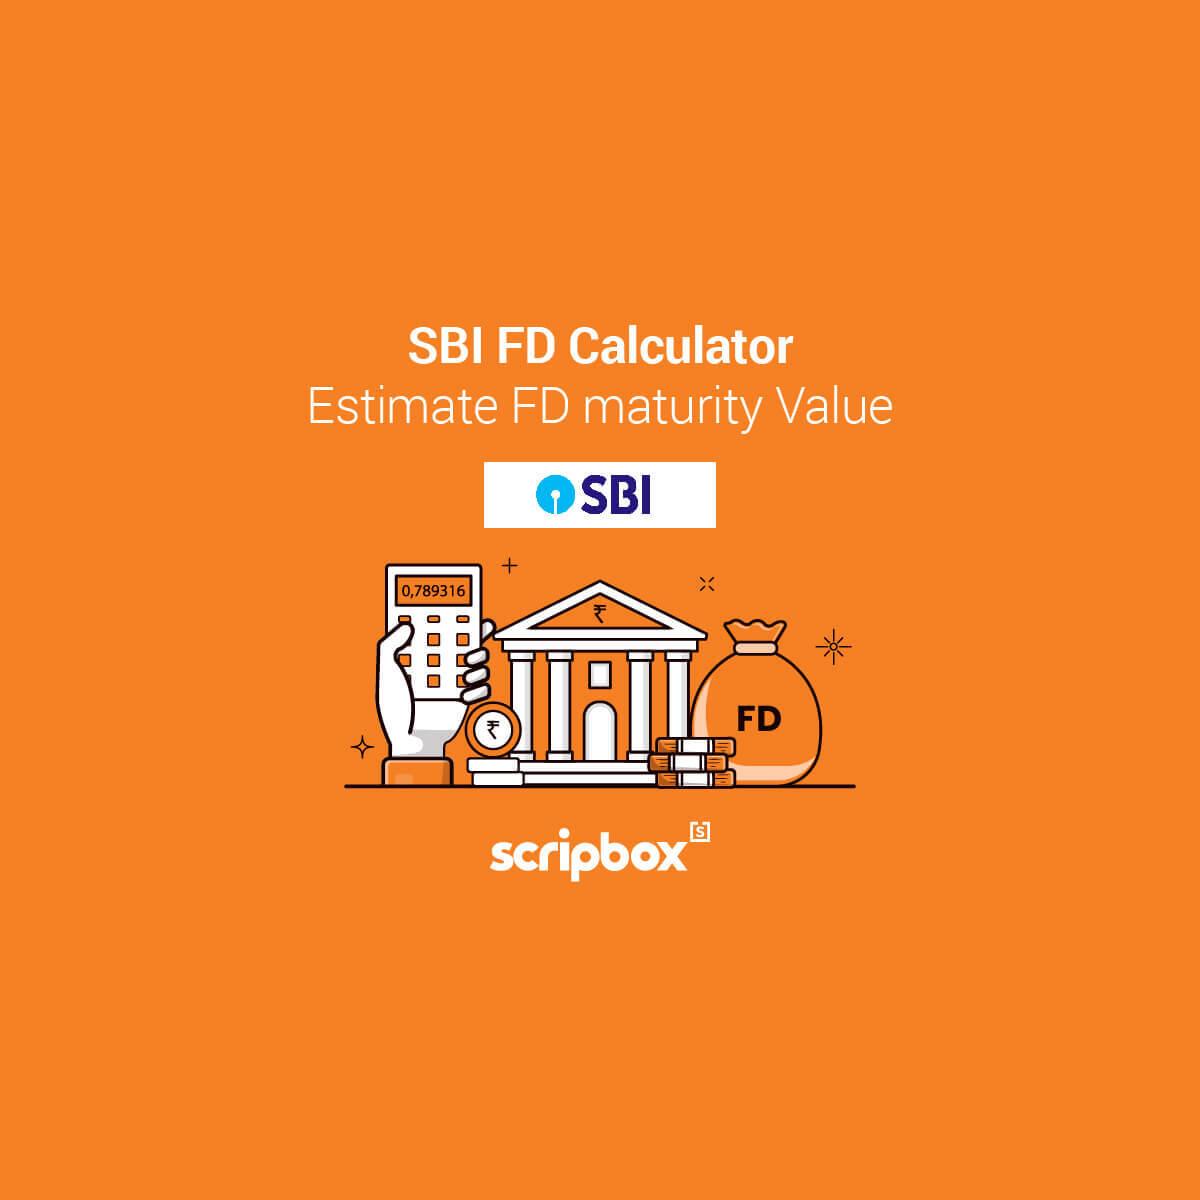 Sbi Fd Calculator Calculate The Interest And Maturity On Fd Scripbox